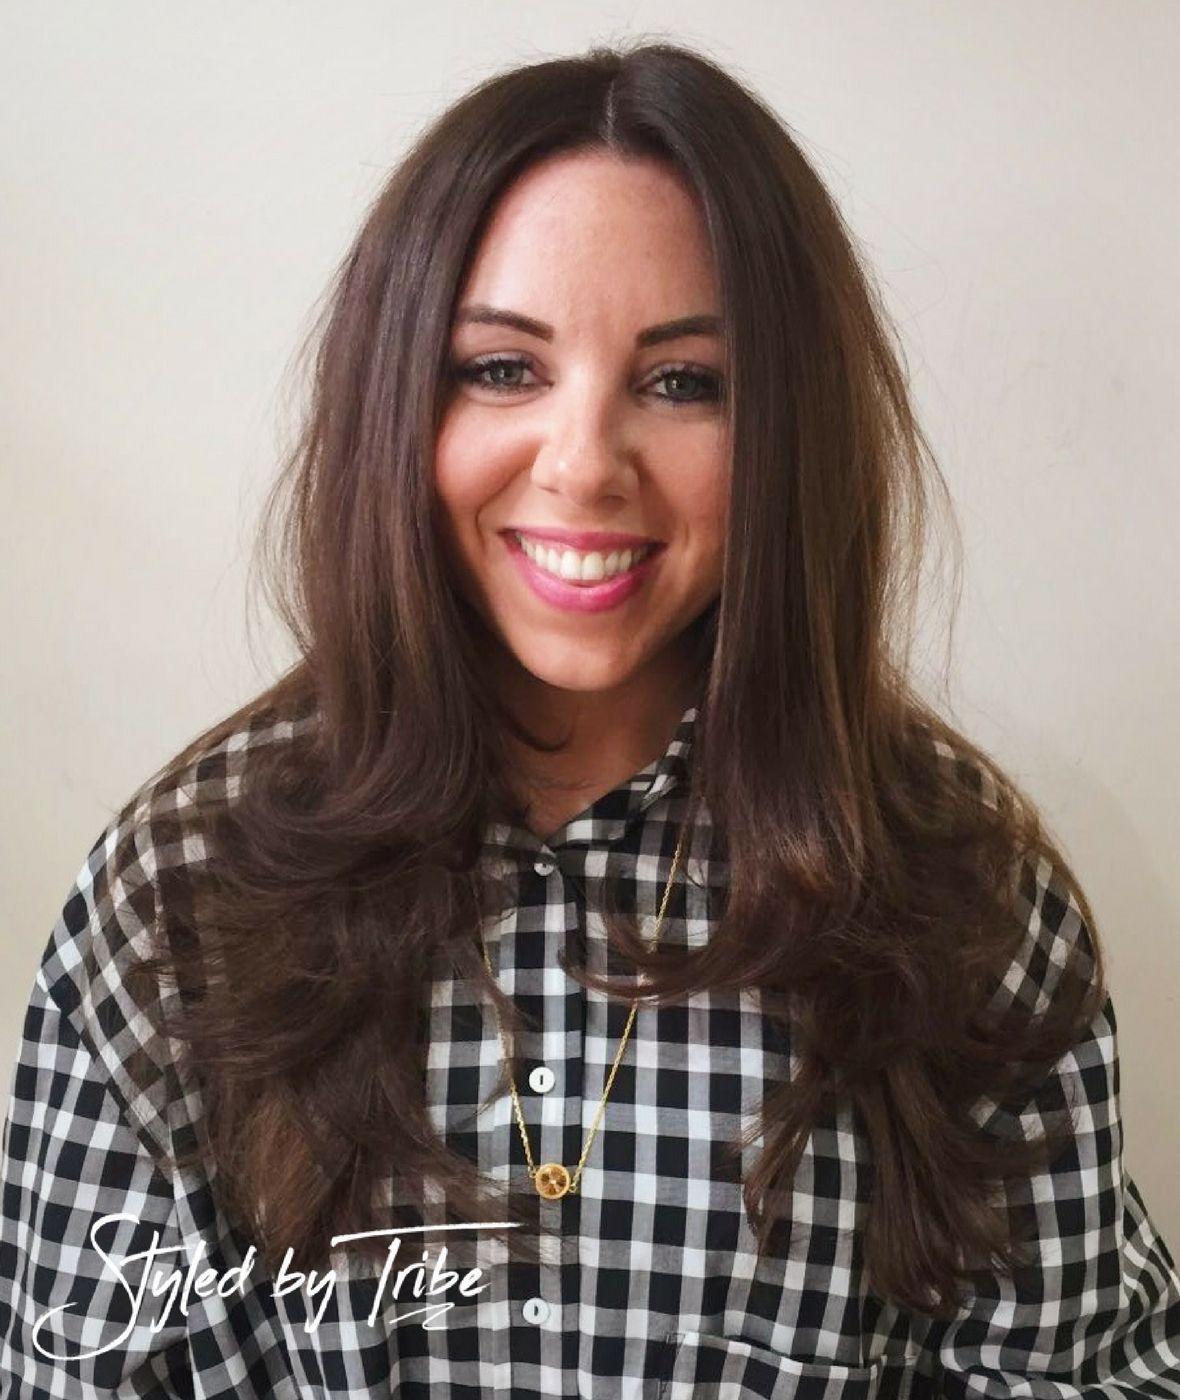 Style inspiration tribe hairdressers chislehurst hair salon